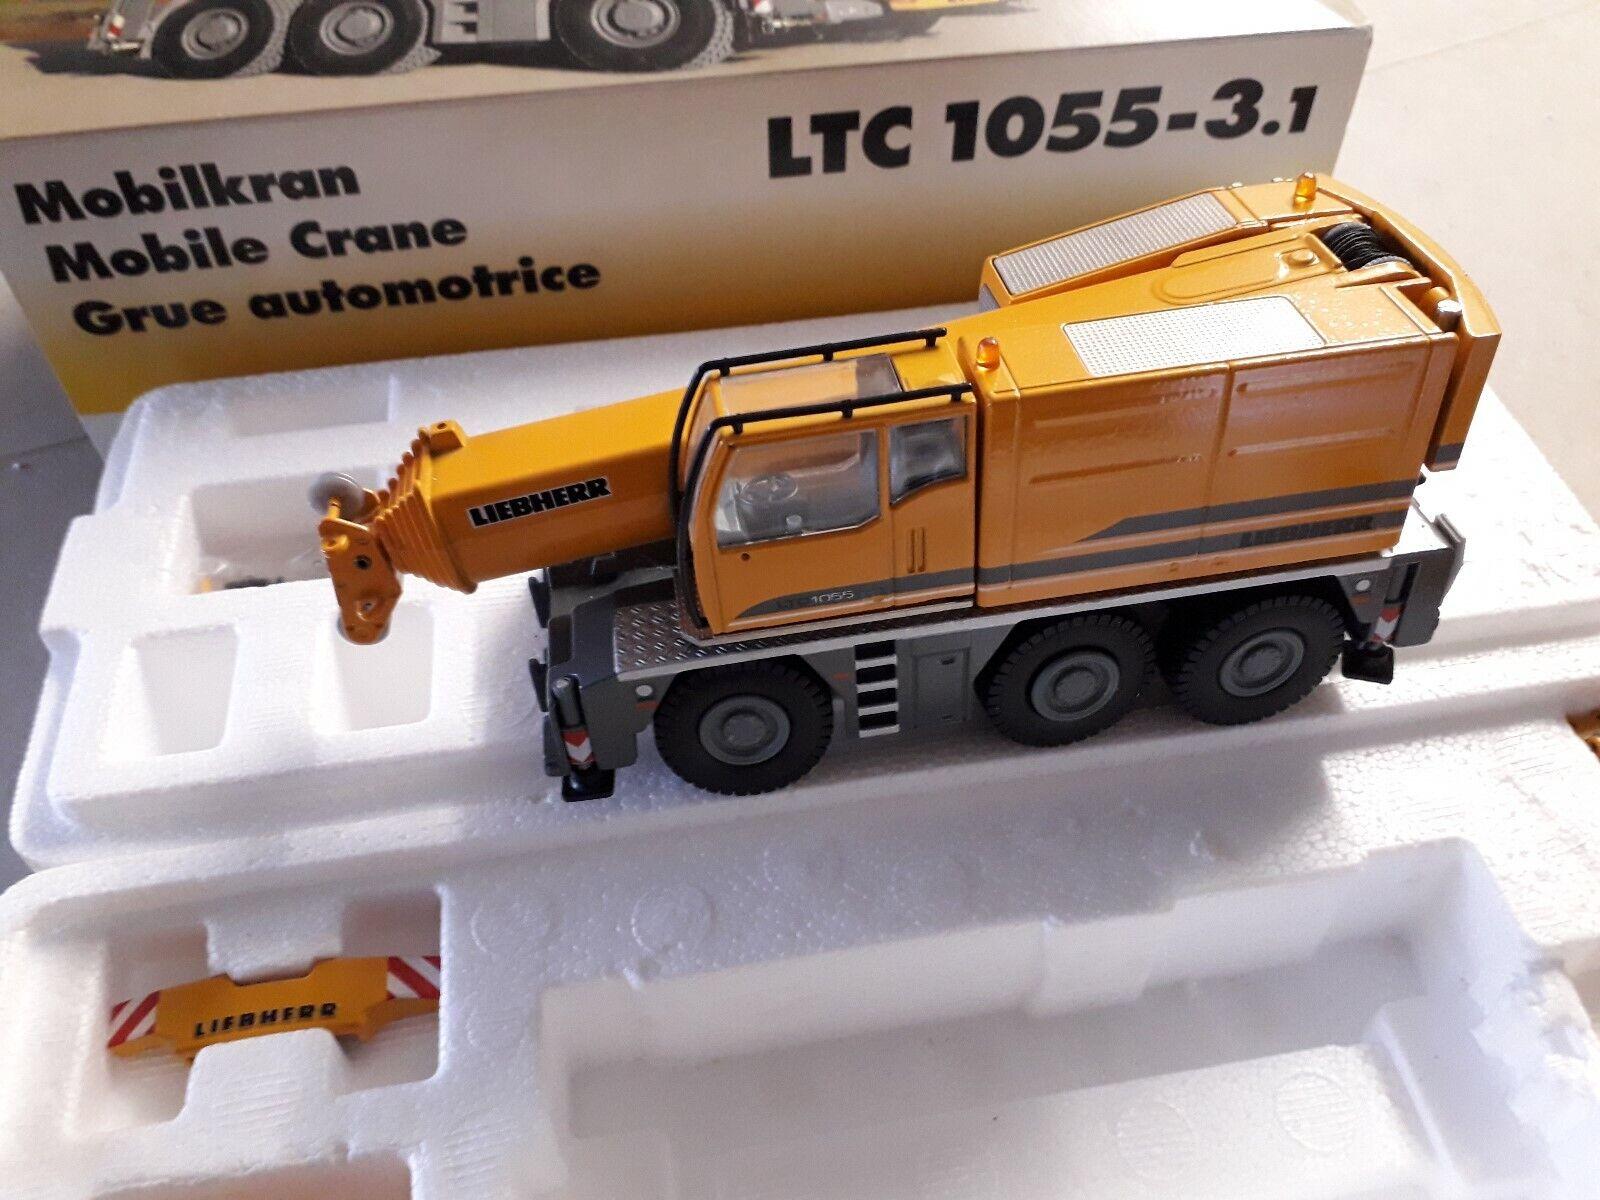 LIEBHERR LTC 1055-3.1 - Mobilkran - Conrad 20100 1 50 OVP nagelneu